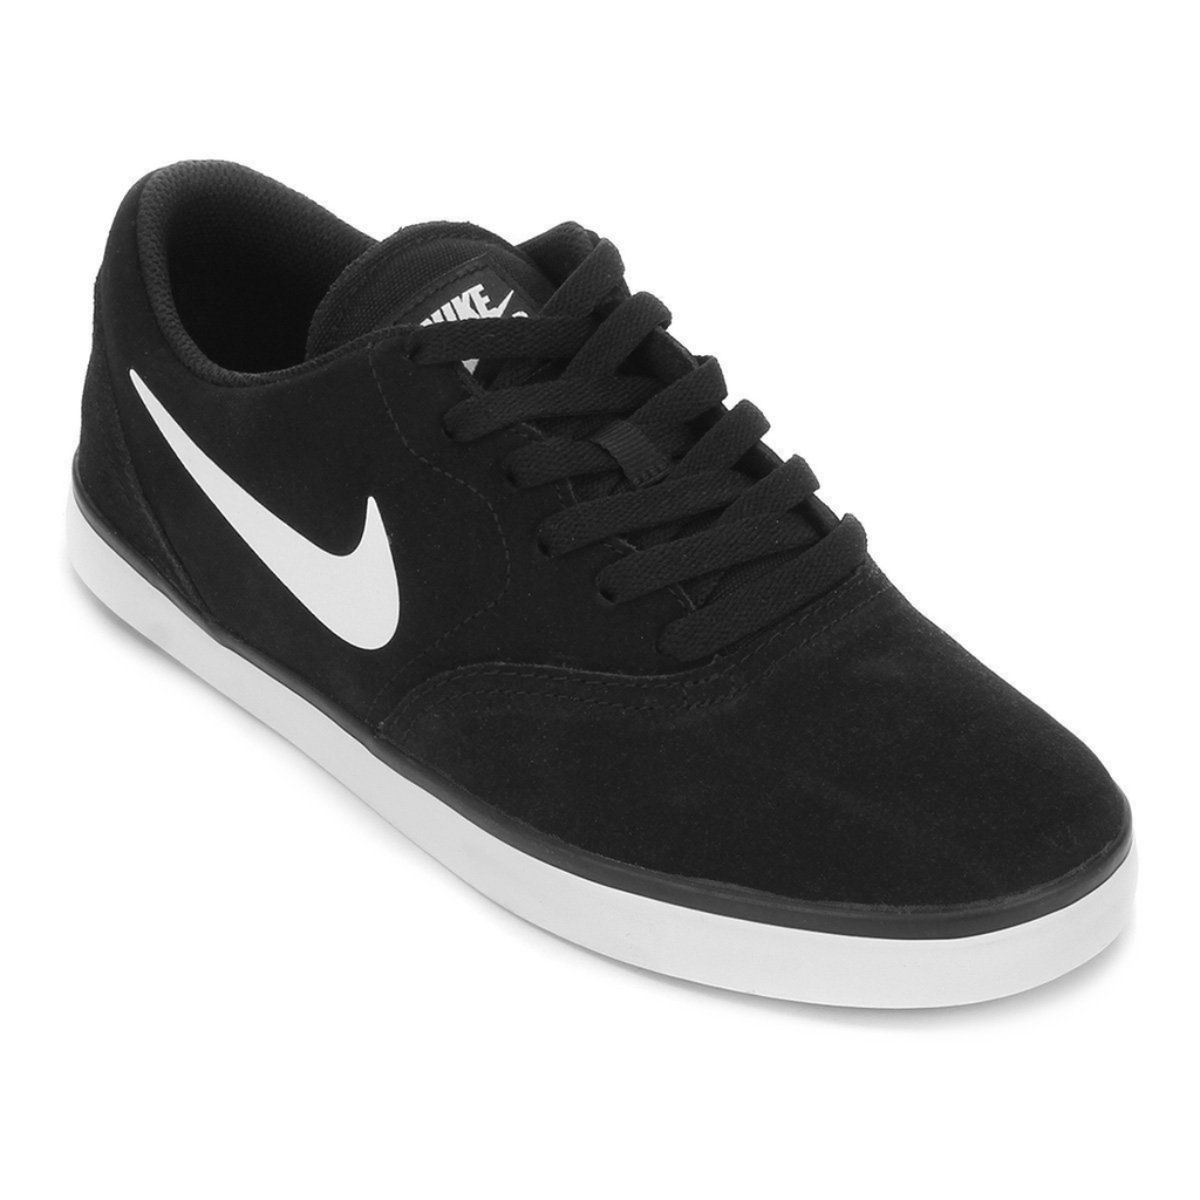 Tênis Nike Sb Check Preto e Branco